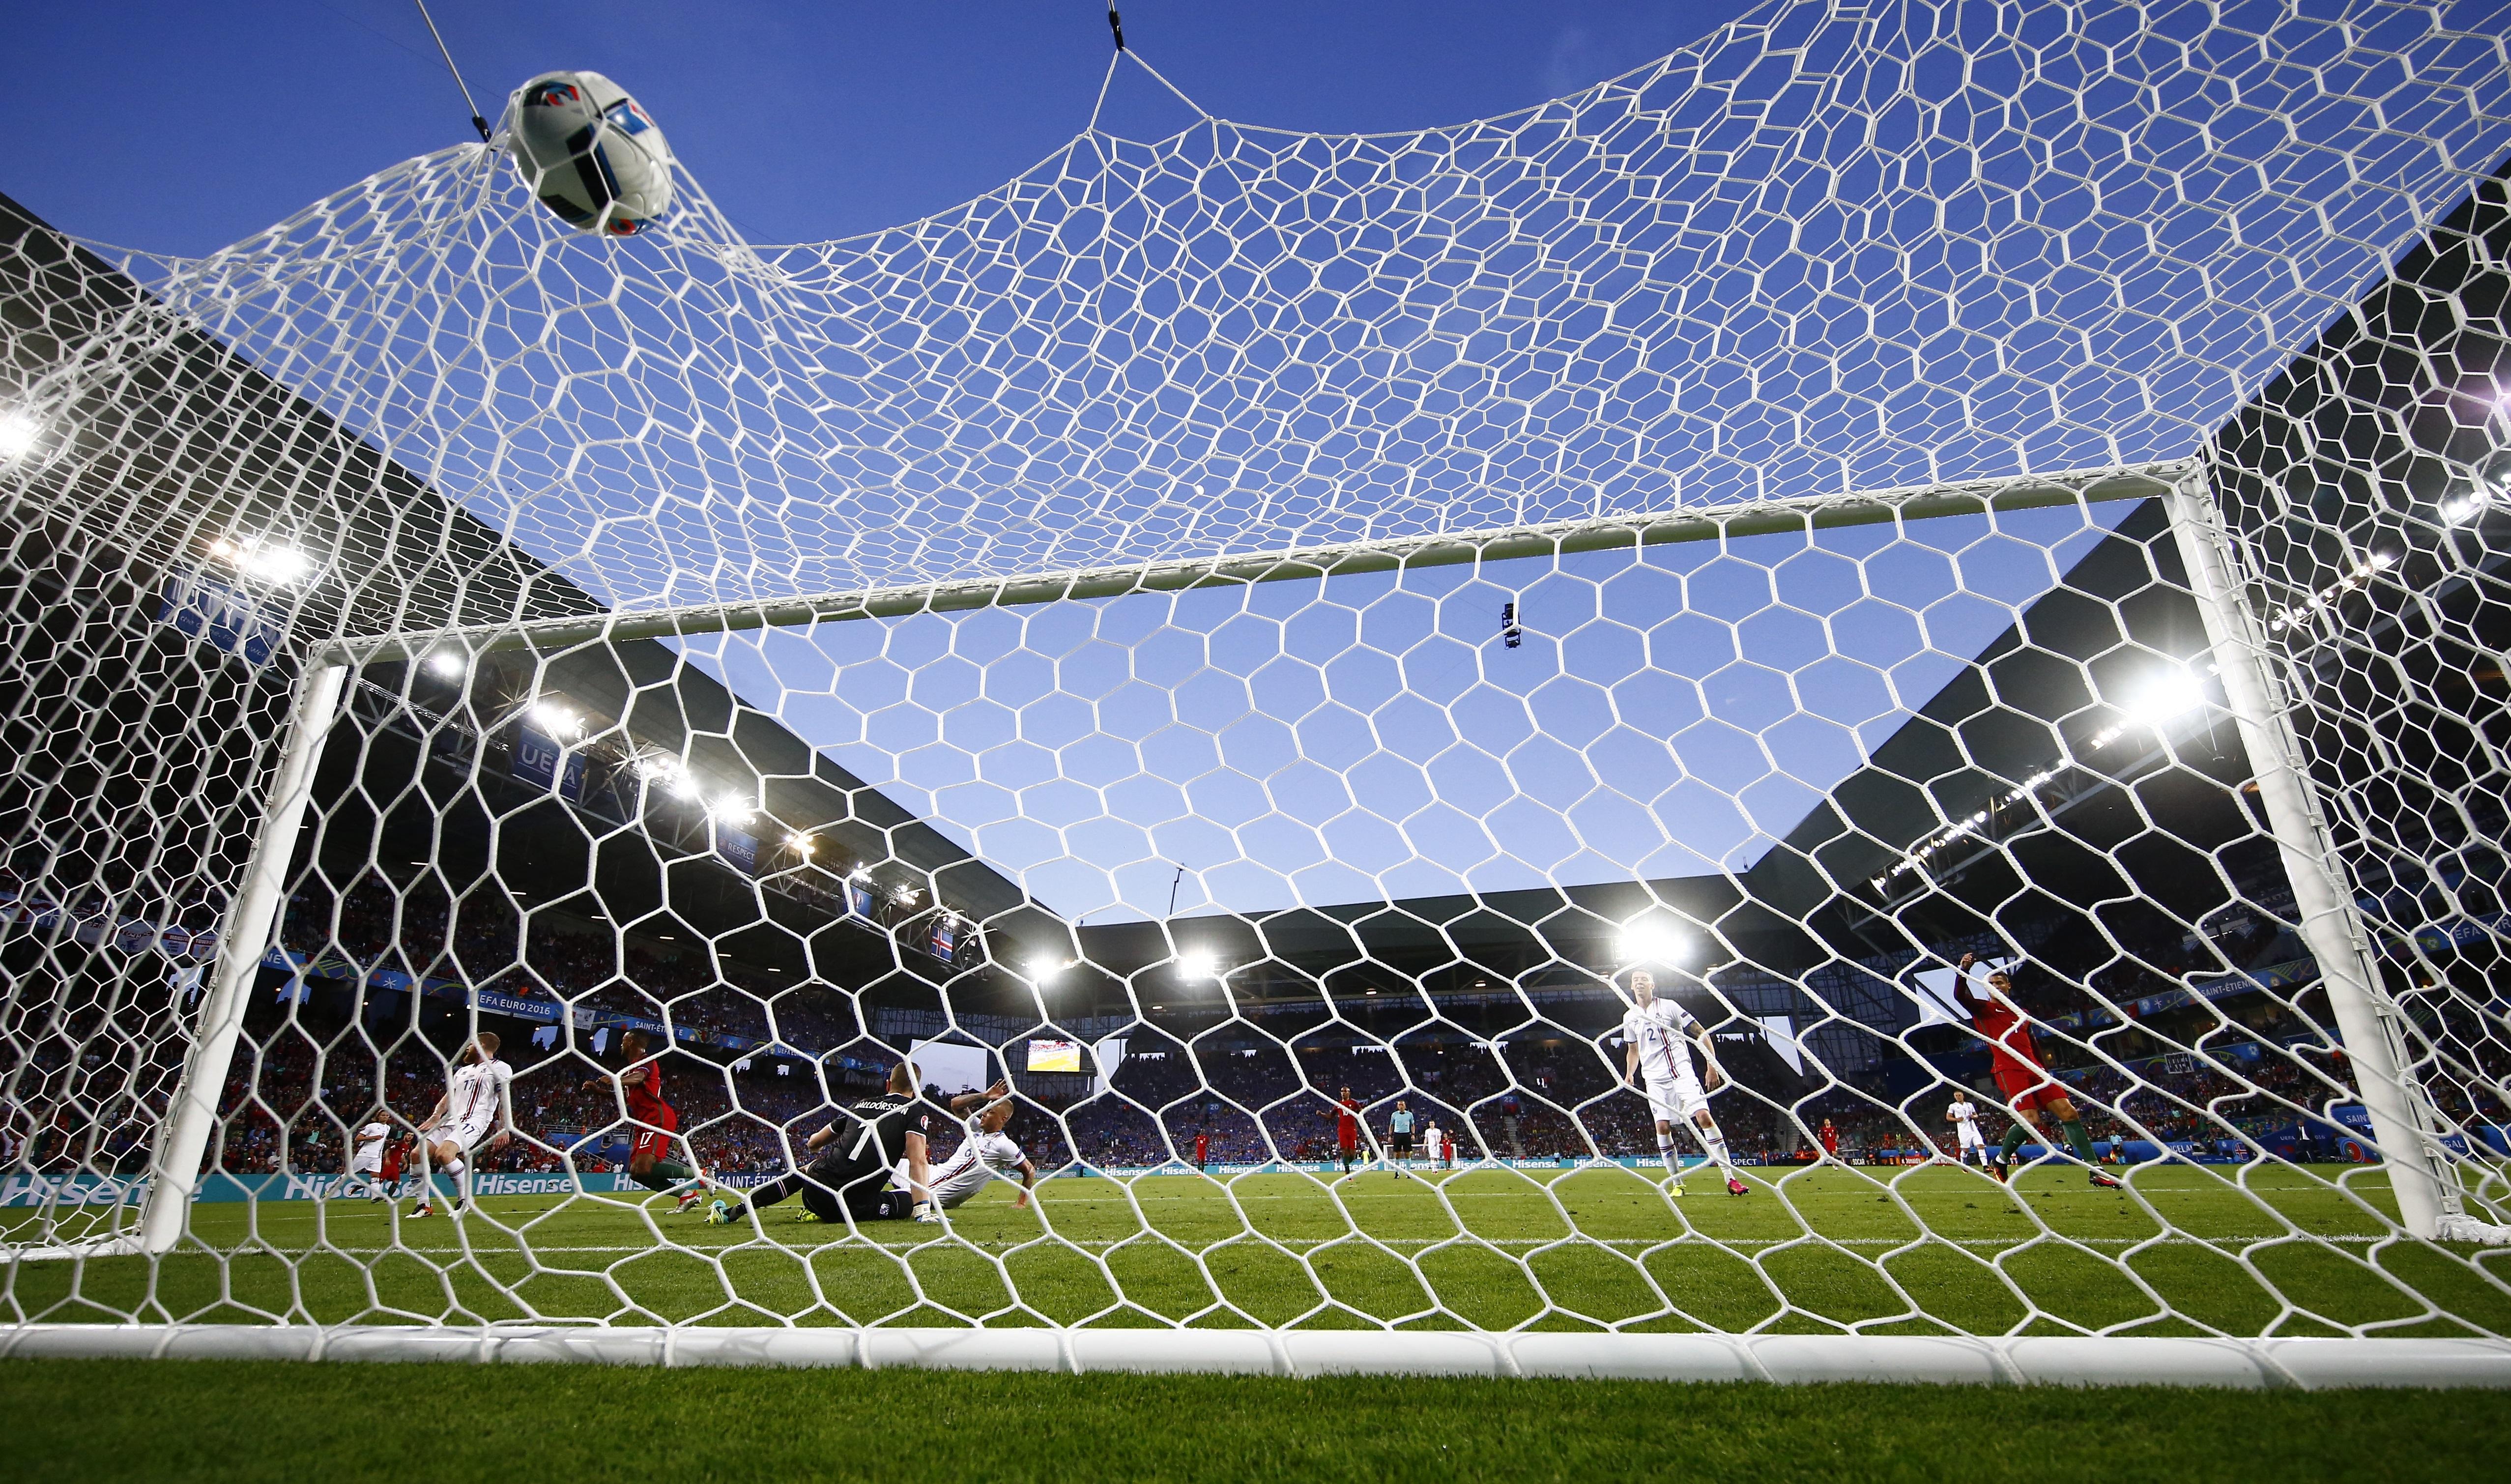 Portugal's Nani scores